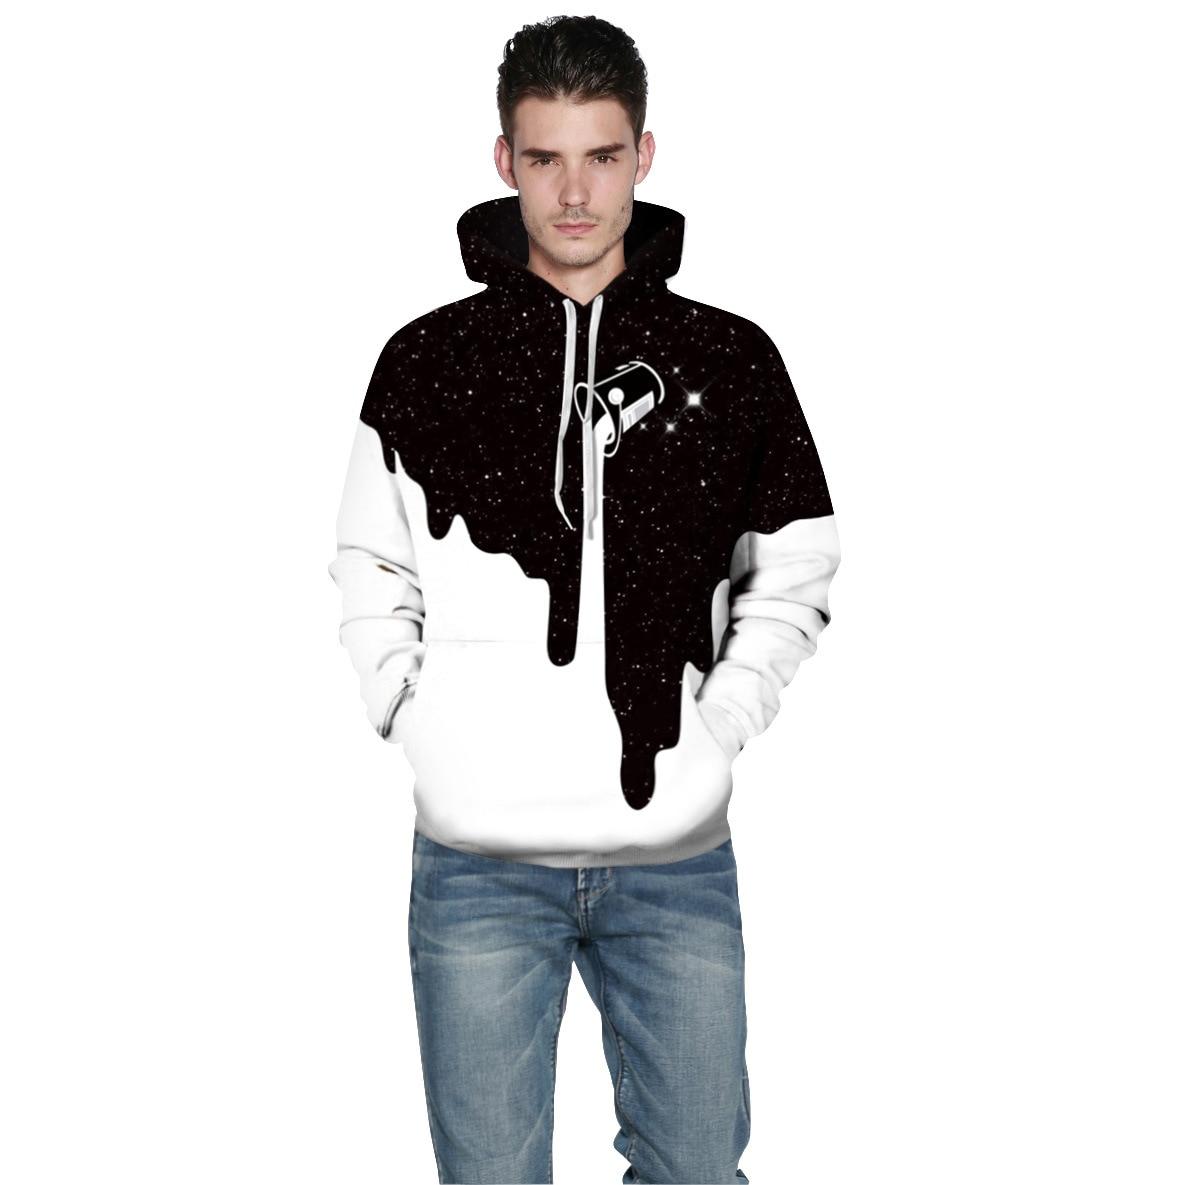 3D Sweatshirts Print Milk Space Galaxy Hooded Hoodies Unisex Tops Wholesale and retail Winter Loose Thin Hooded Hoody Tops